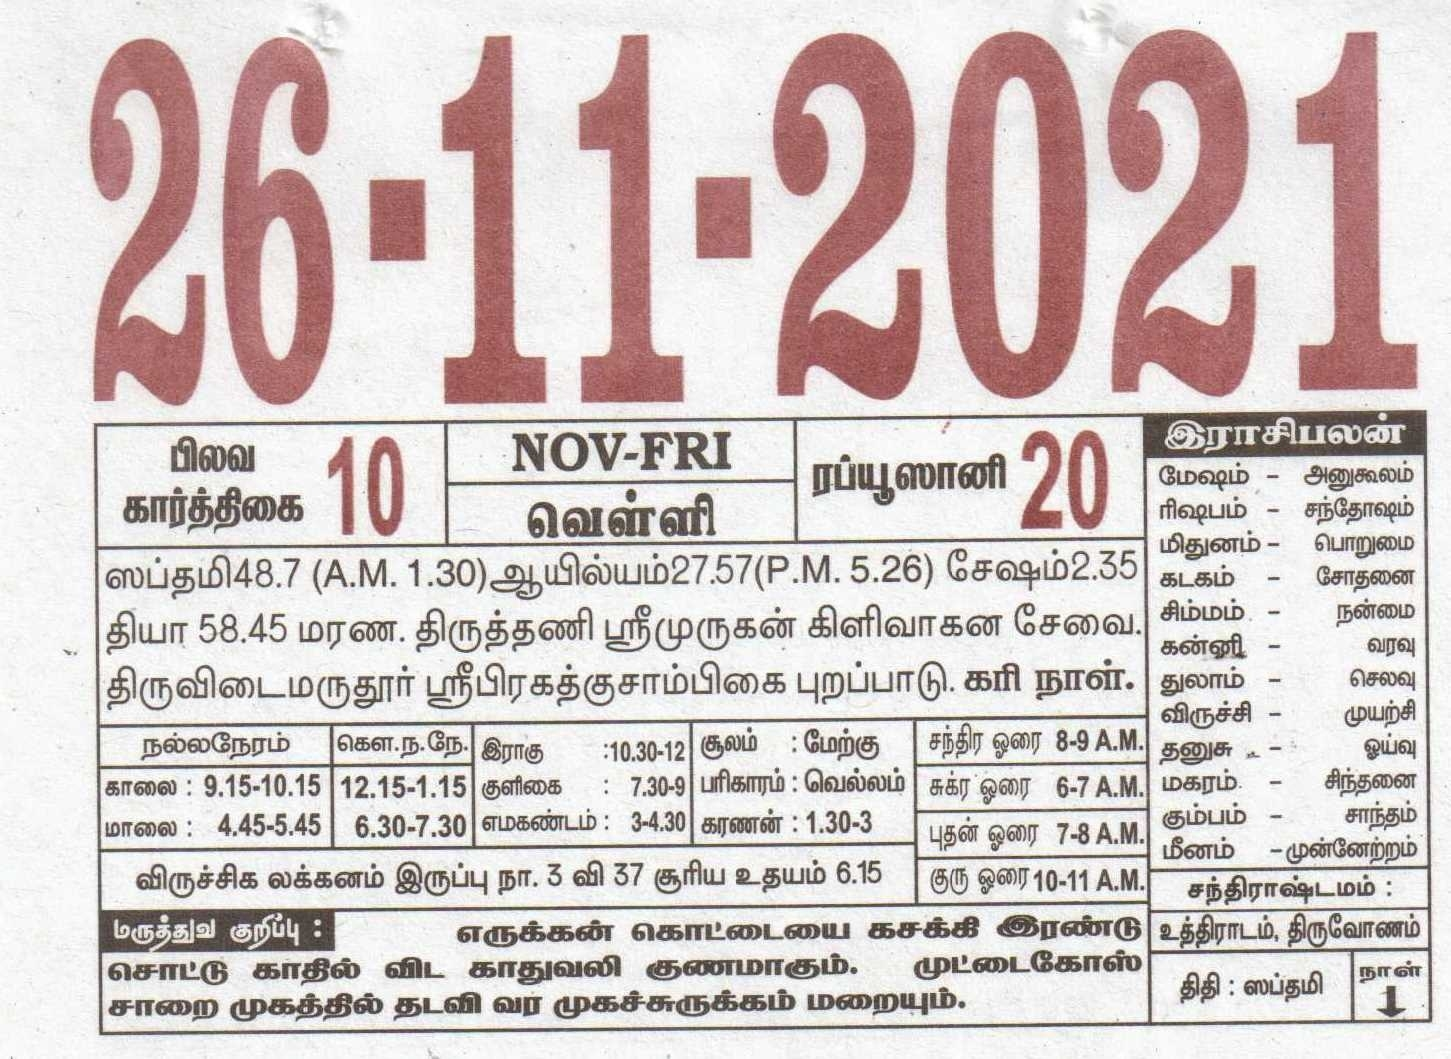 26-11-2021 Daily Calendar | Date 26 , January Daily Tear Off Calendar | Daily Panchangam Rasi Palan June 2021 Tamil Daily Calendar